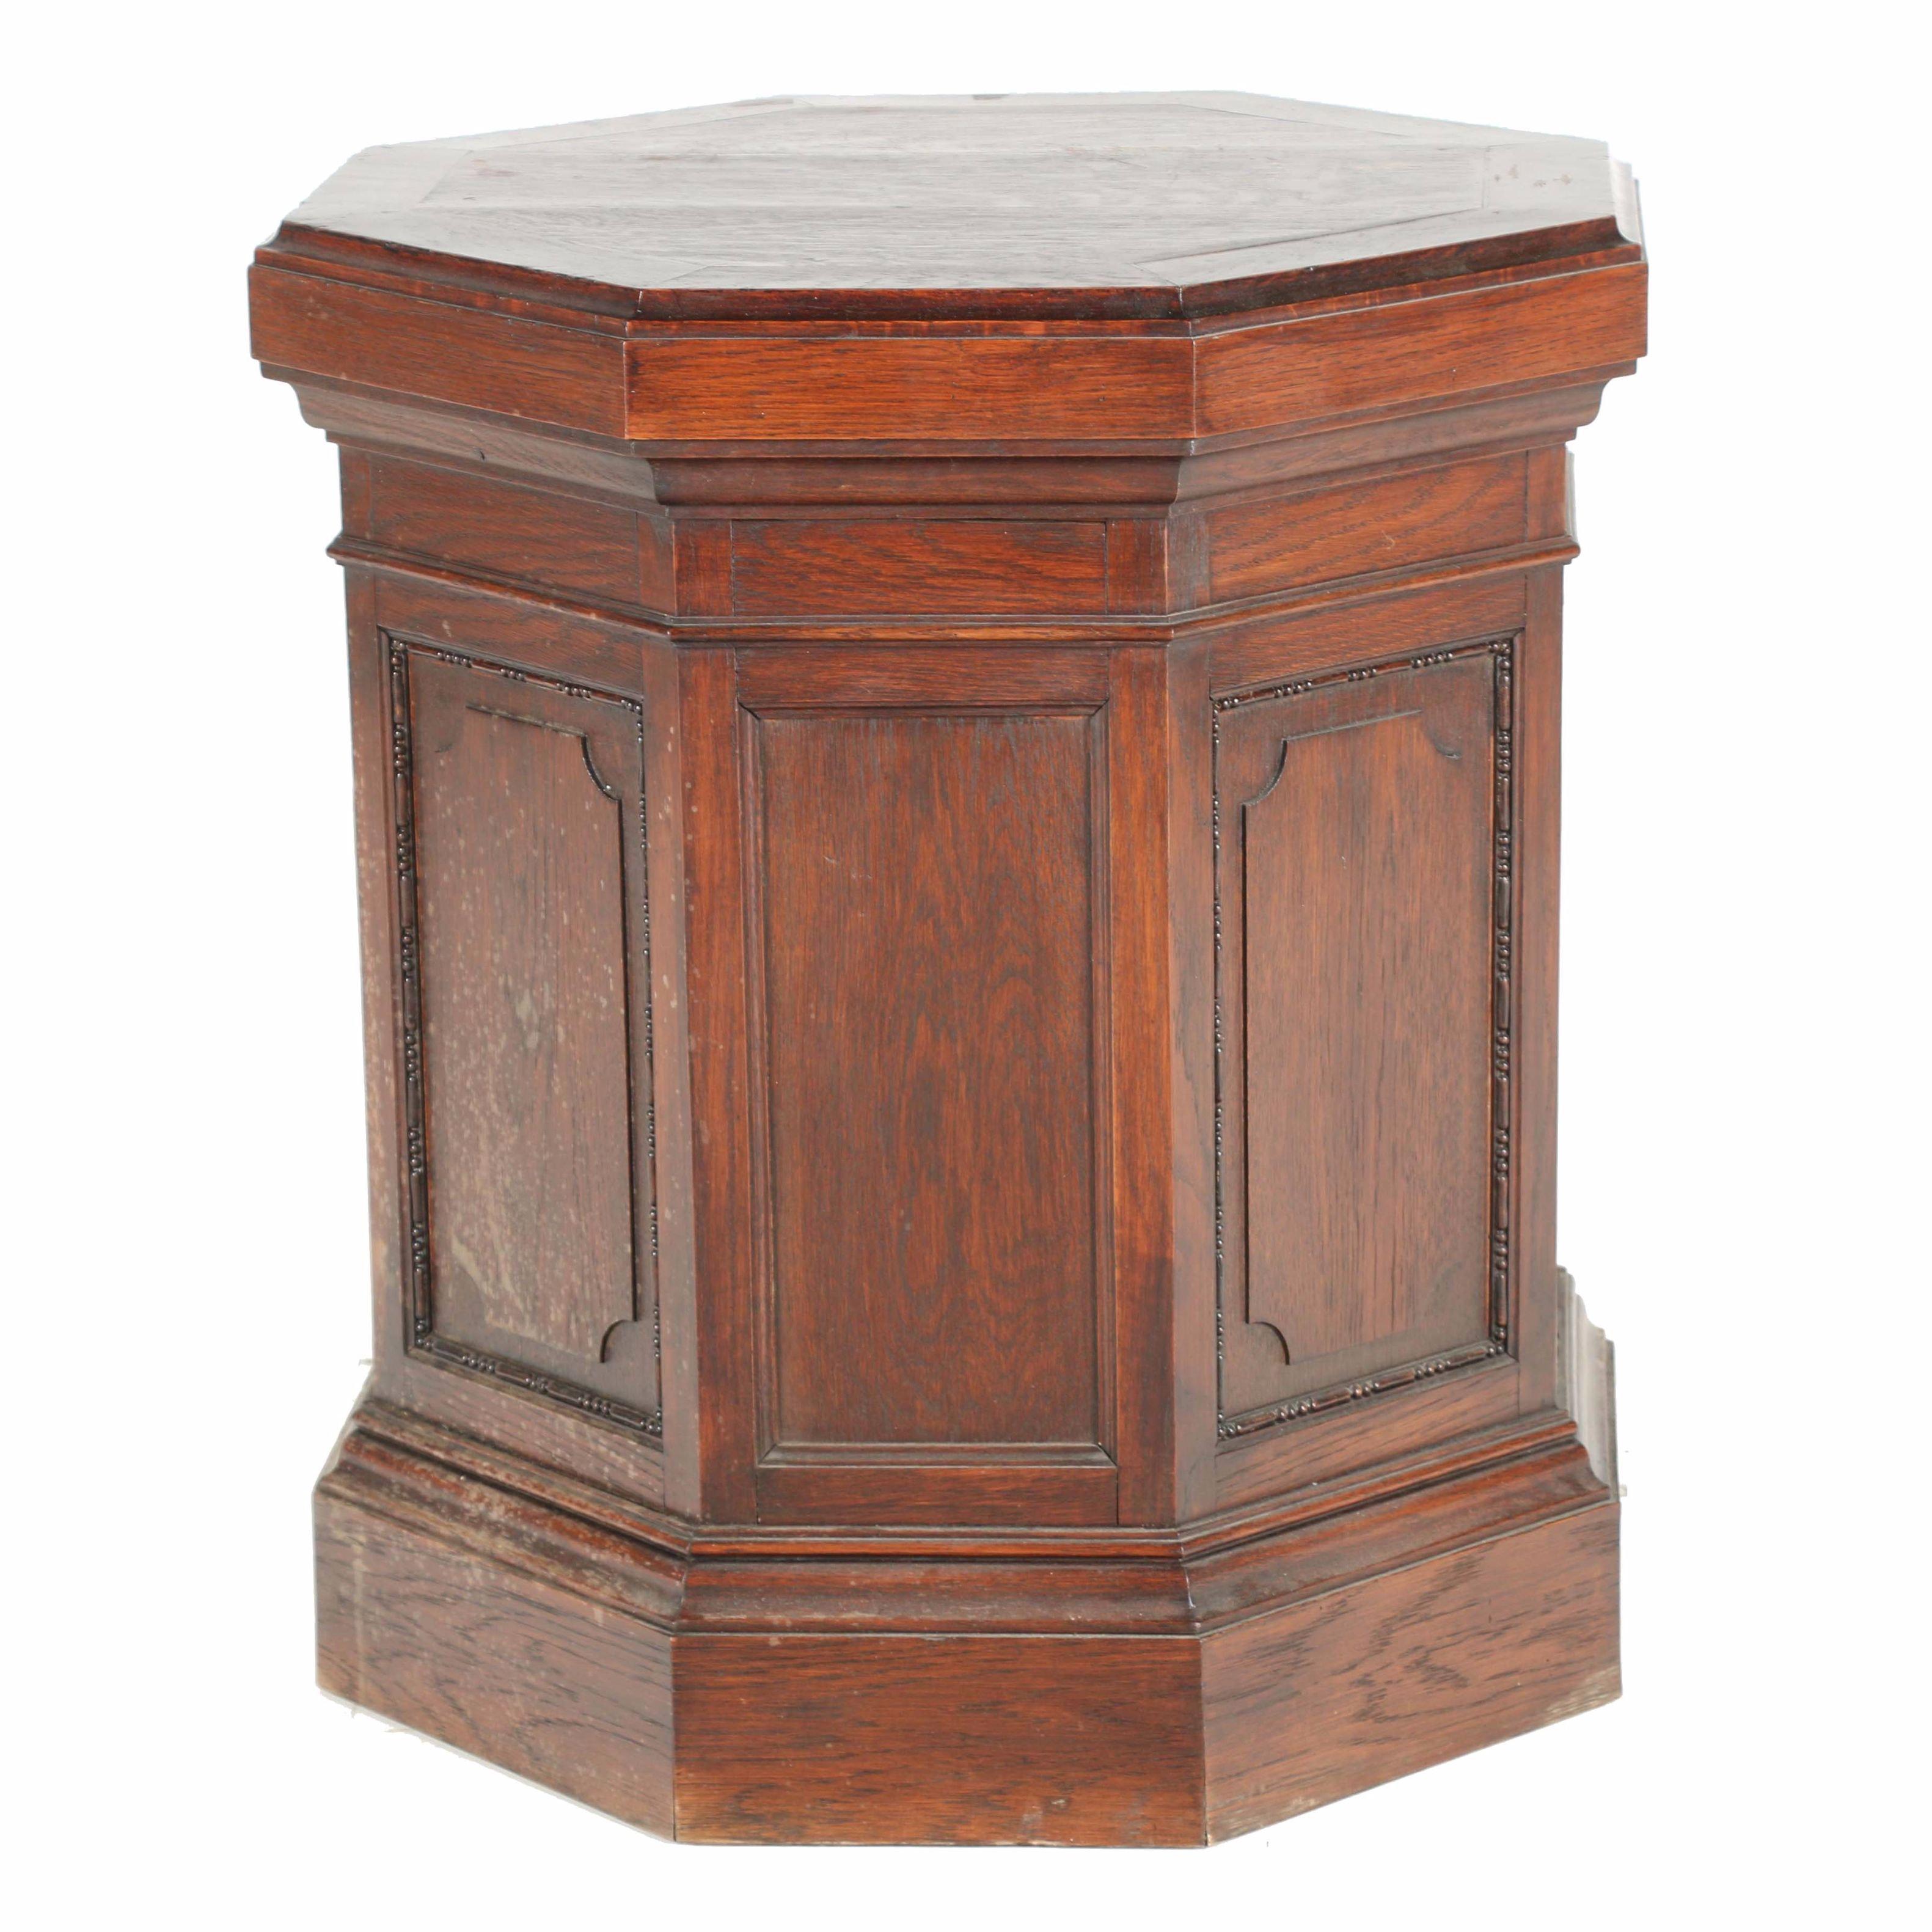 Octagonal Oak Accent Table